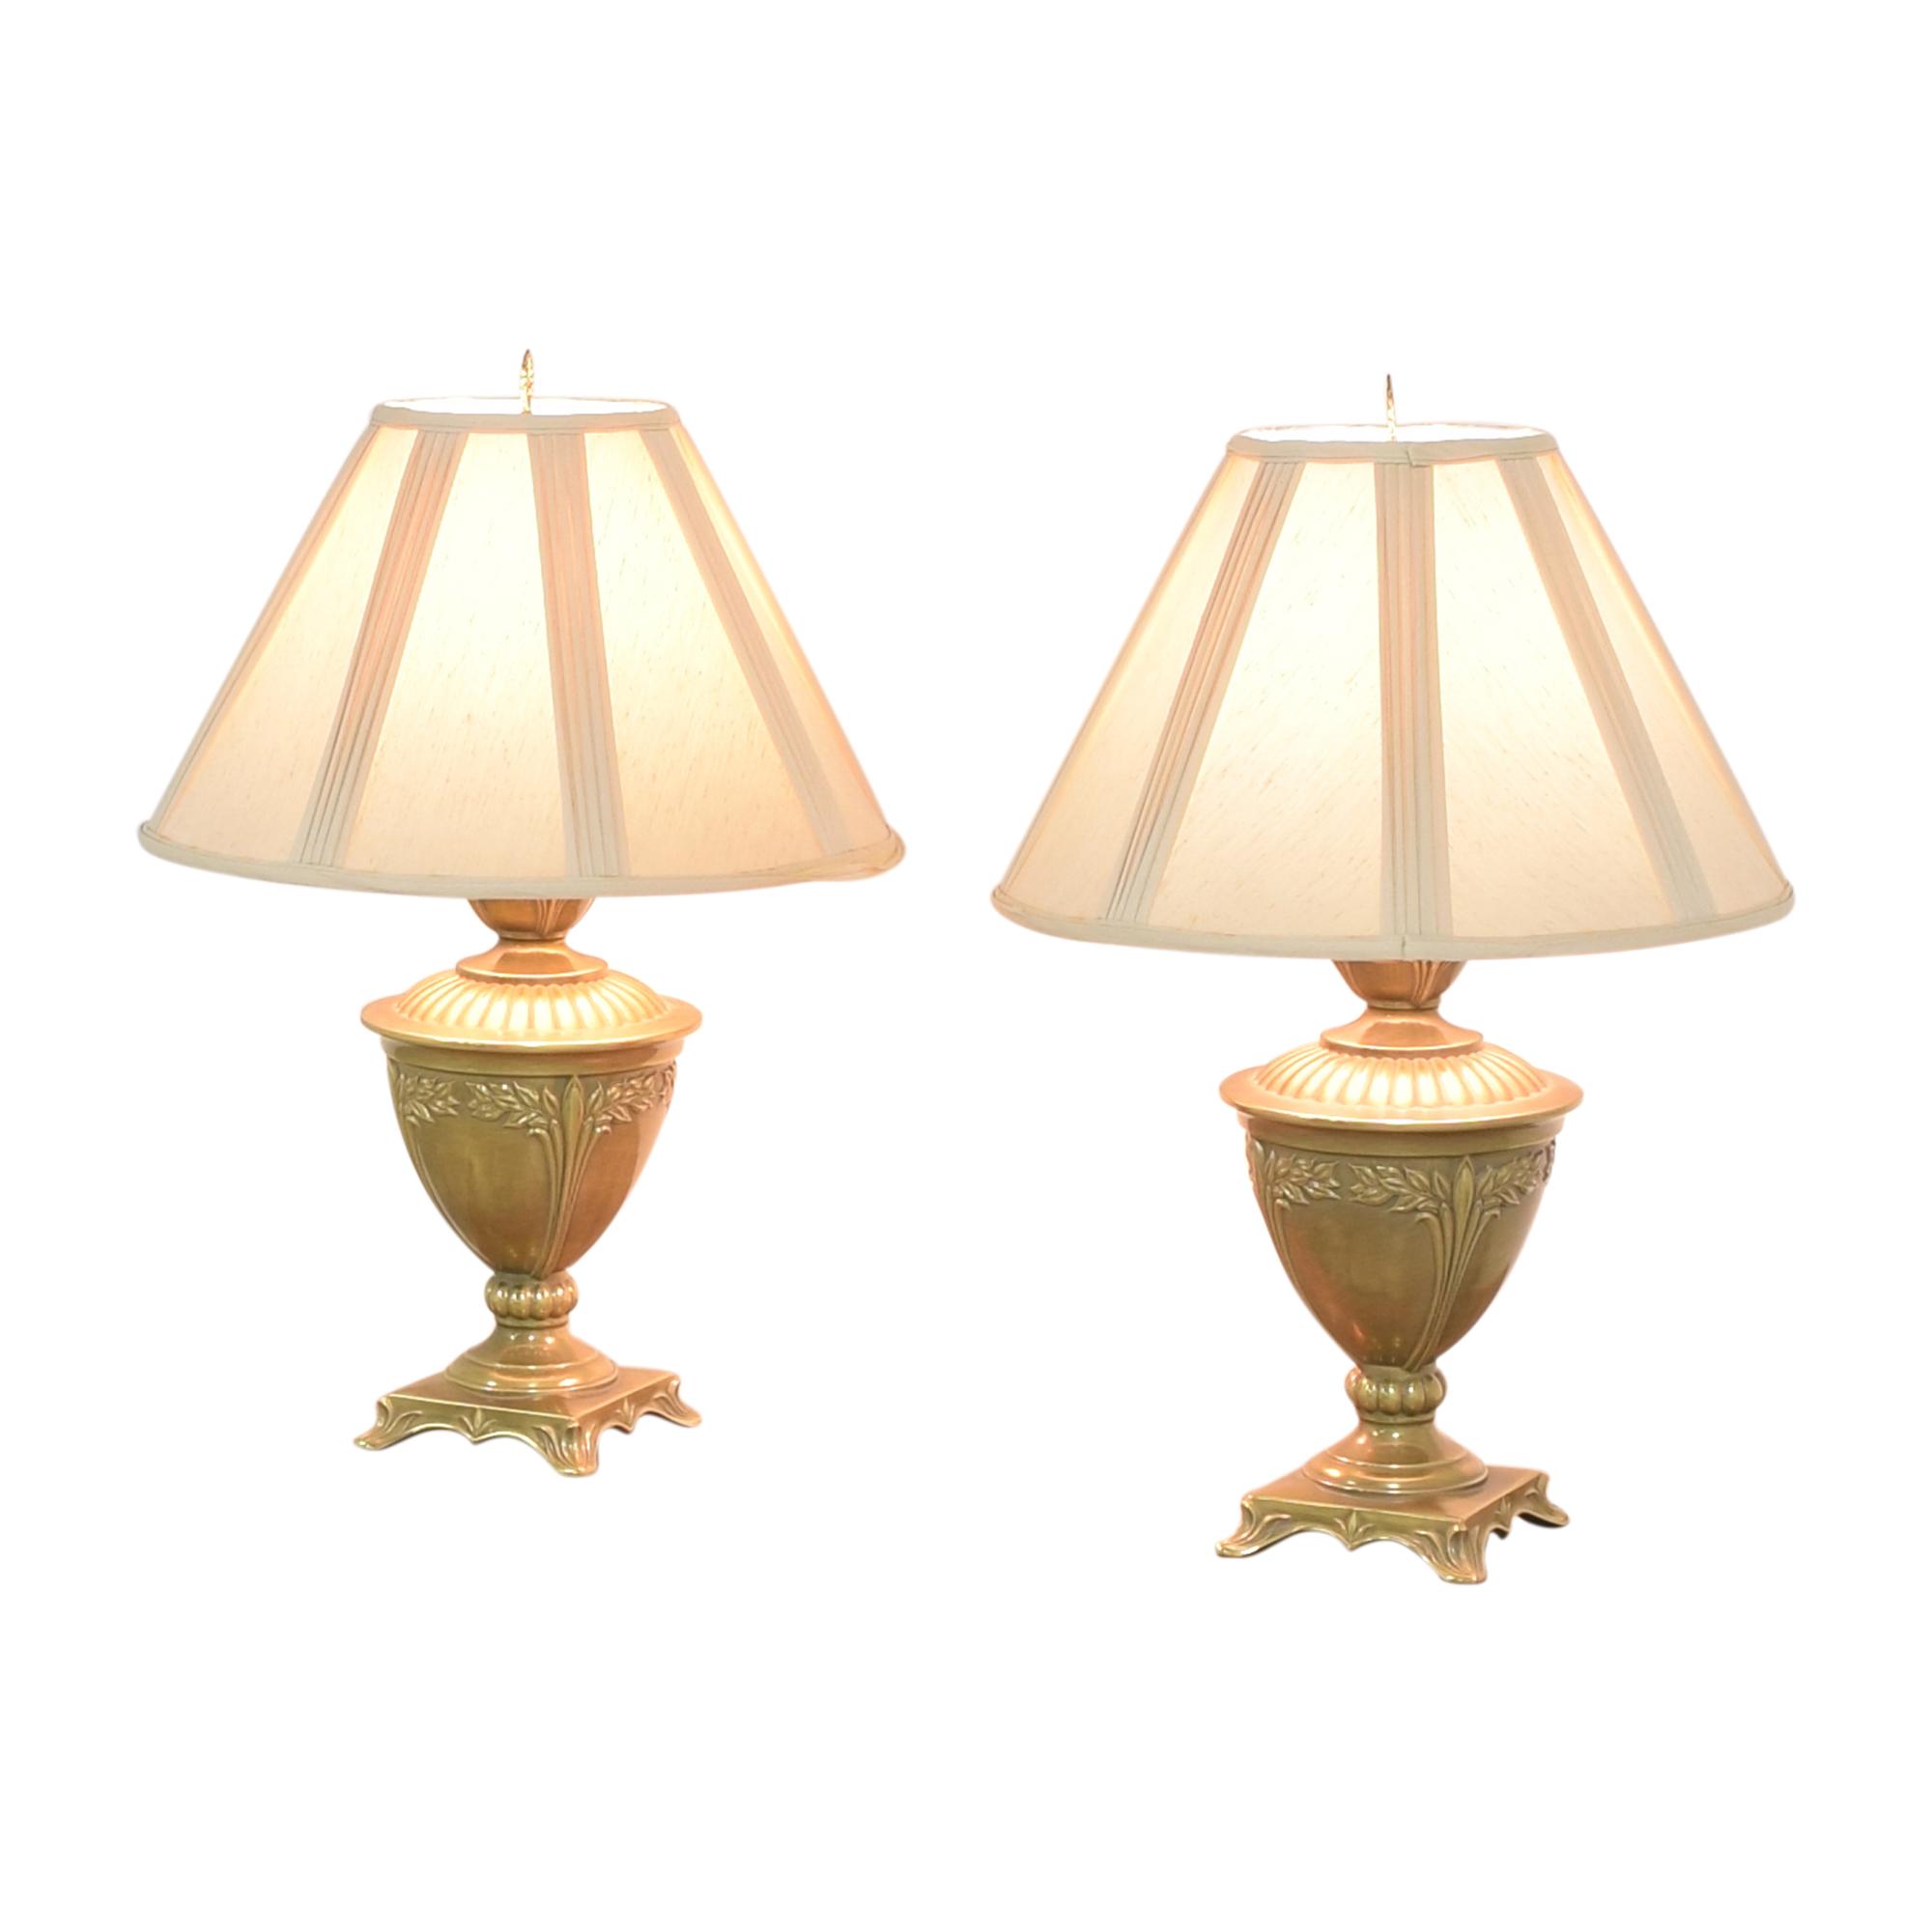 Ethan Allen Ethan Allen Urn Table Lamps Decor